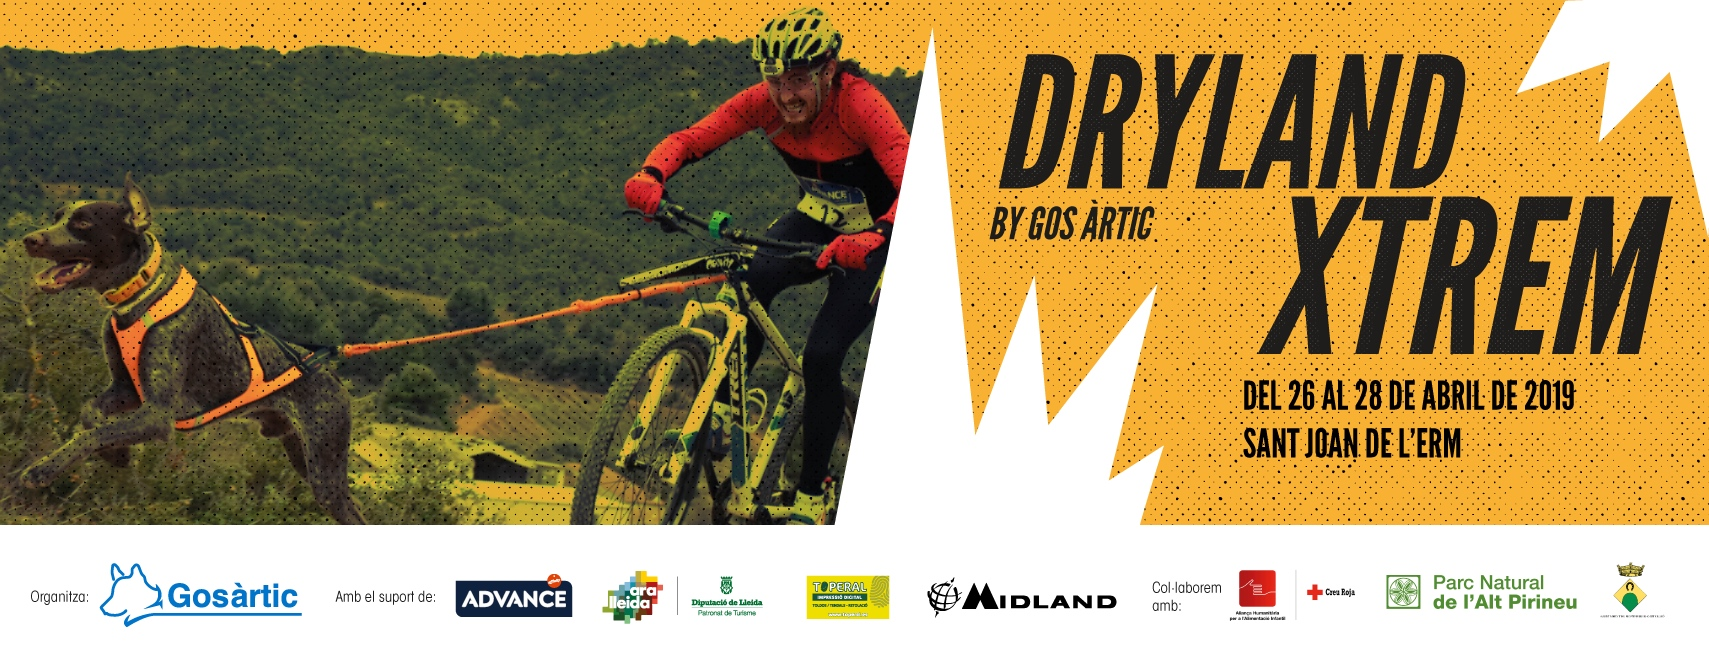 Dryland-Xtrem-FB